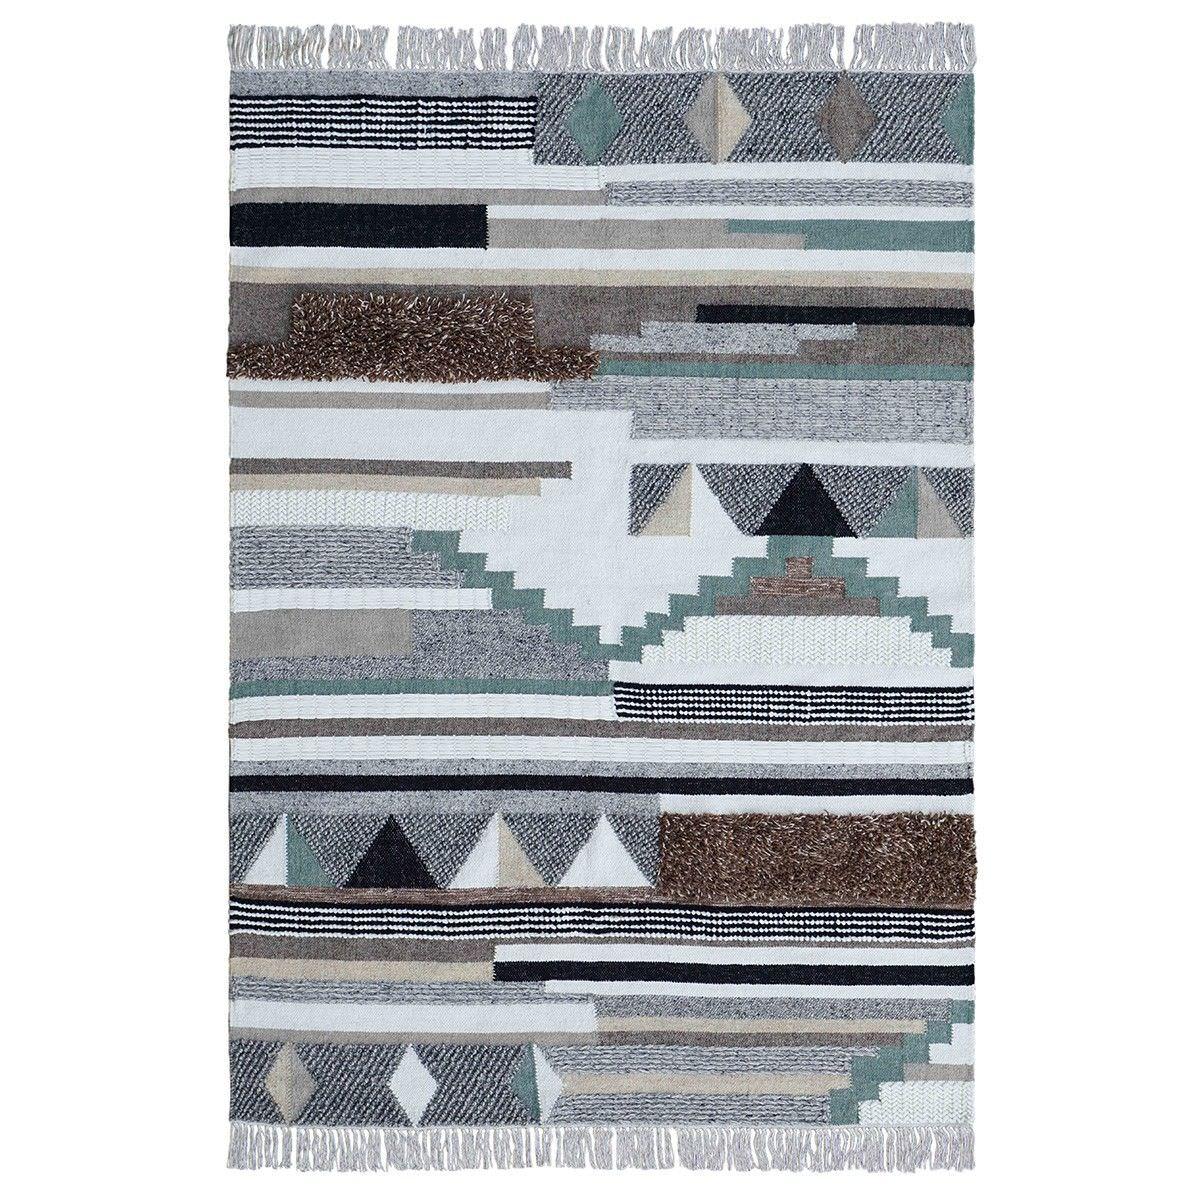 Adi Handwoven Wool Rug, 230x160cm